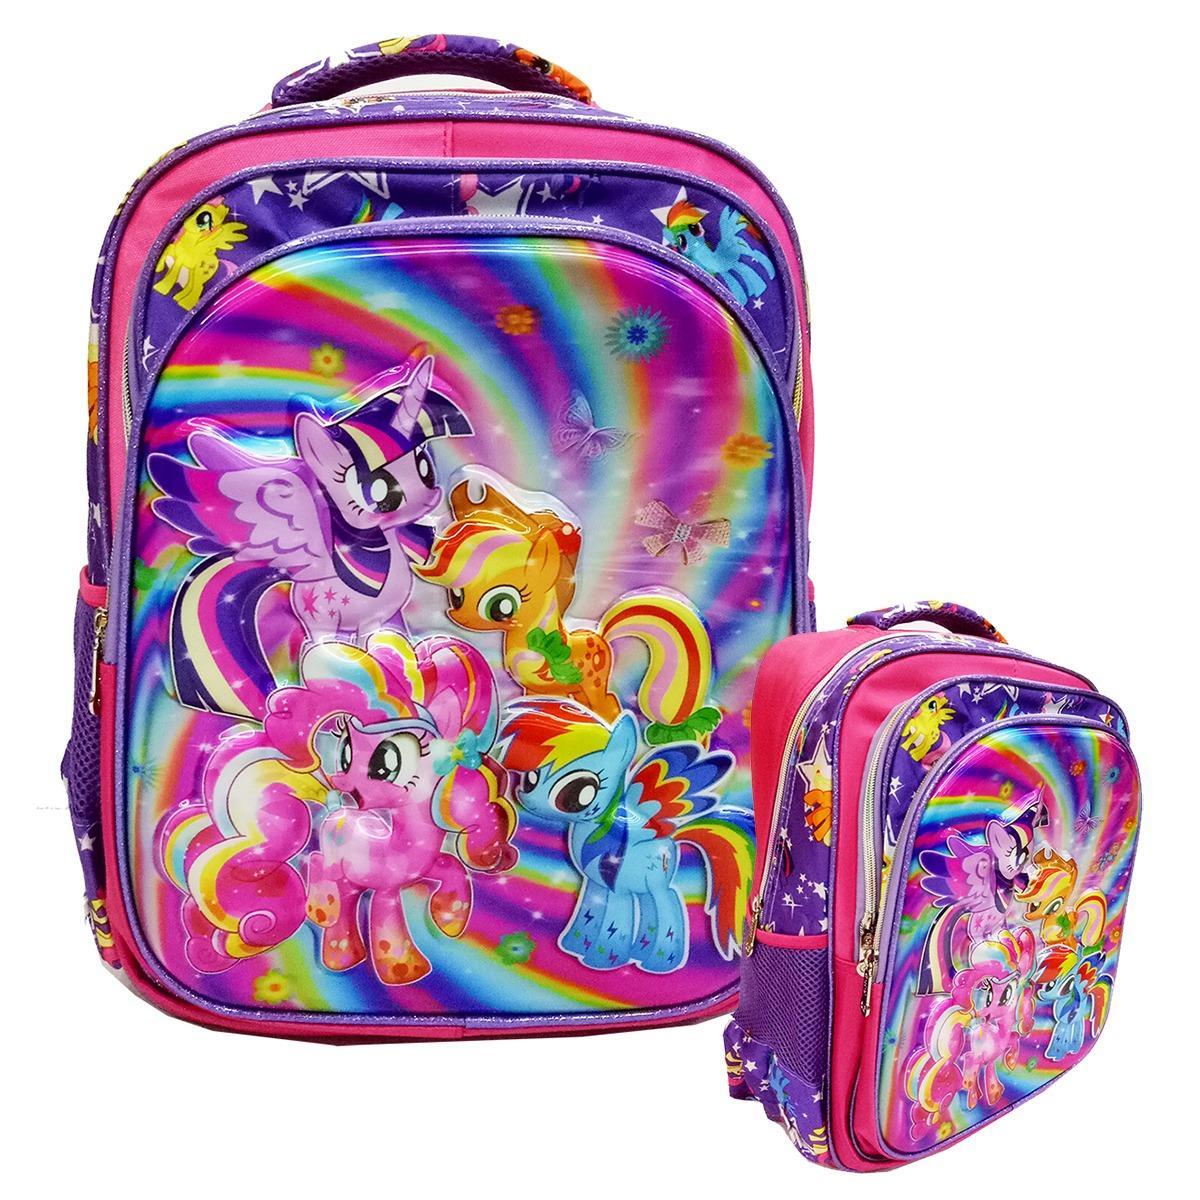 Harga Onlan My Little Pony 5D Hologram Tas Ransel Sd Ukuran 3 Kantung Besar Import Ungu Online